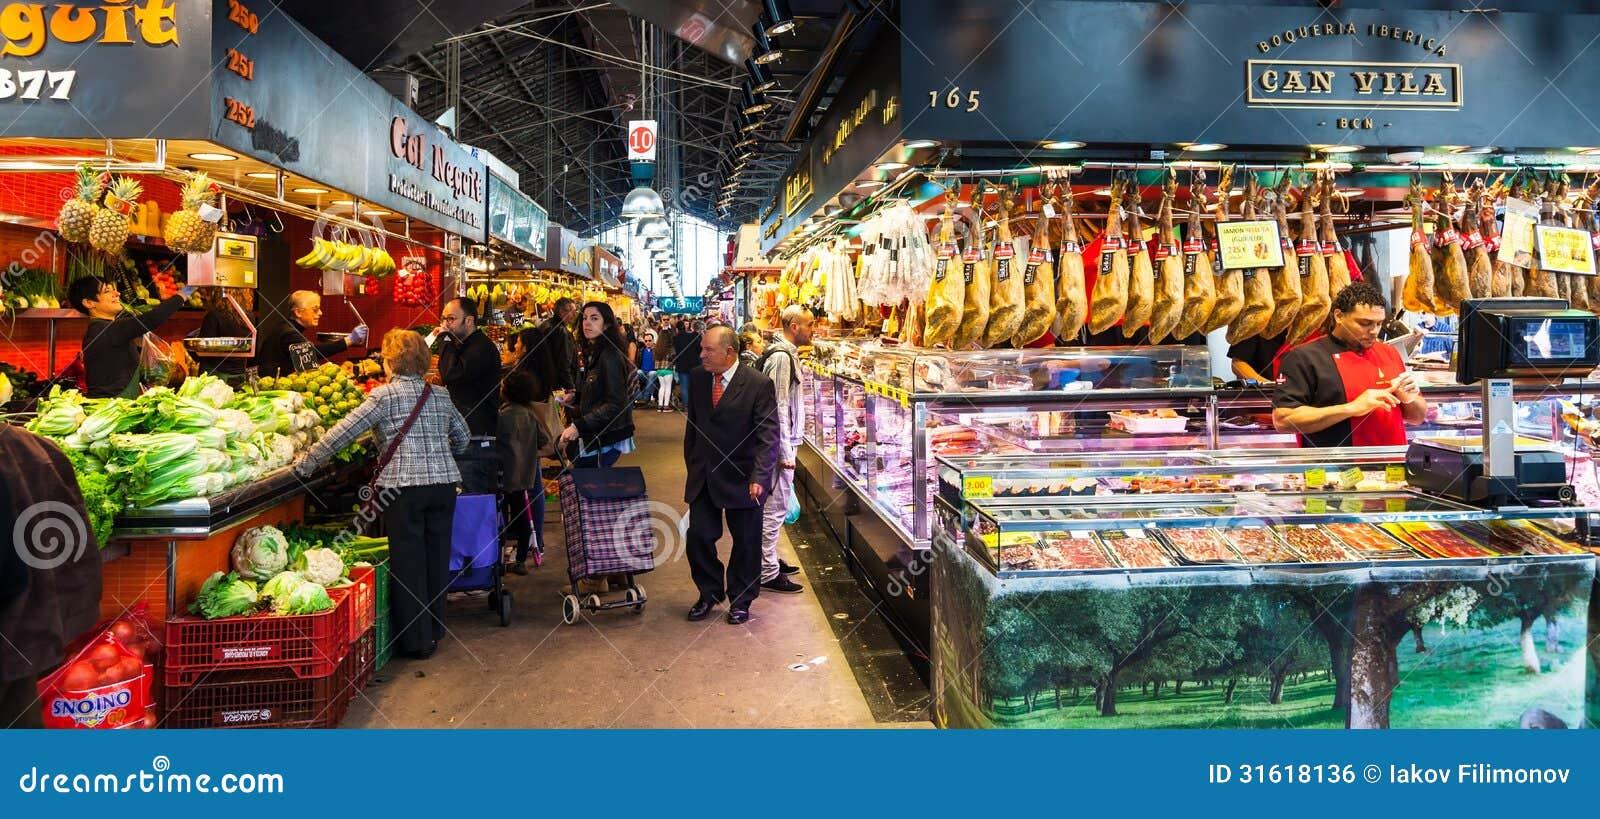 Interior del mercado de boqueria barcelona foto editorial - Calle boqueria barcelona ...